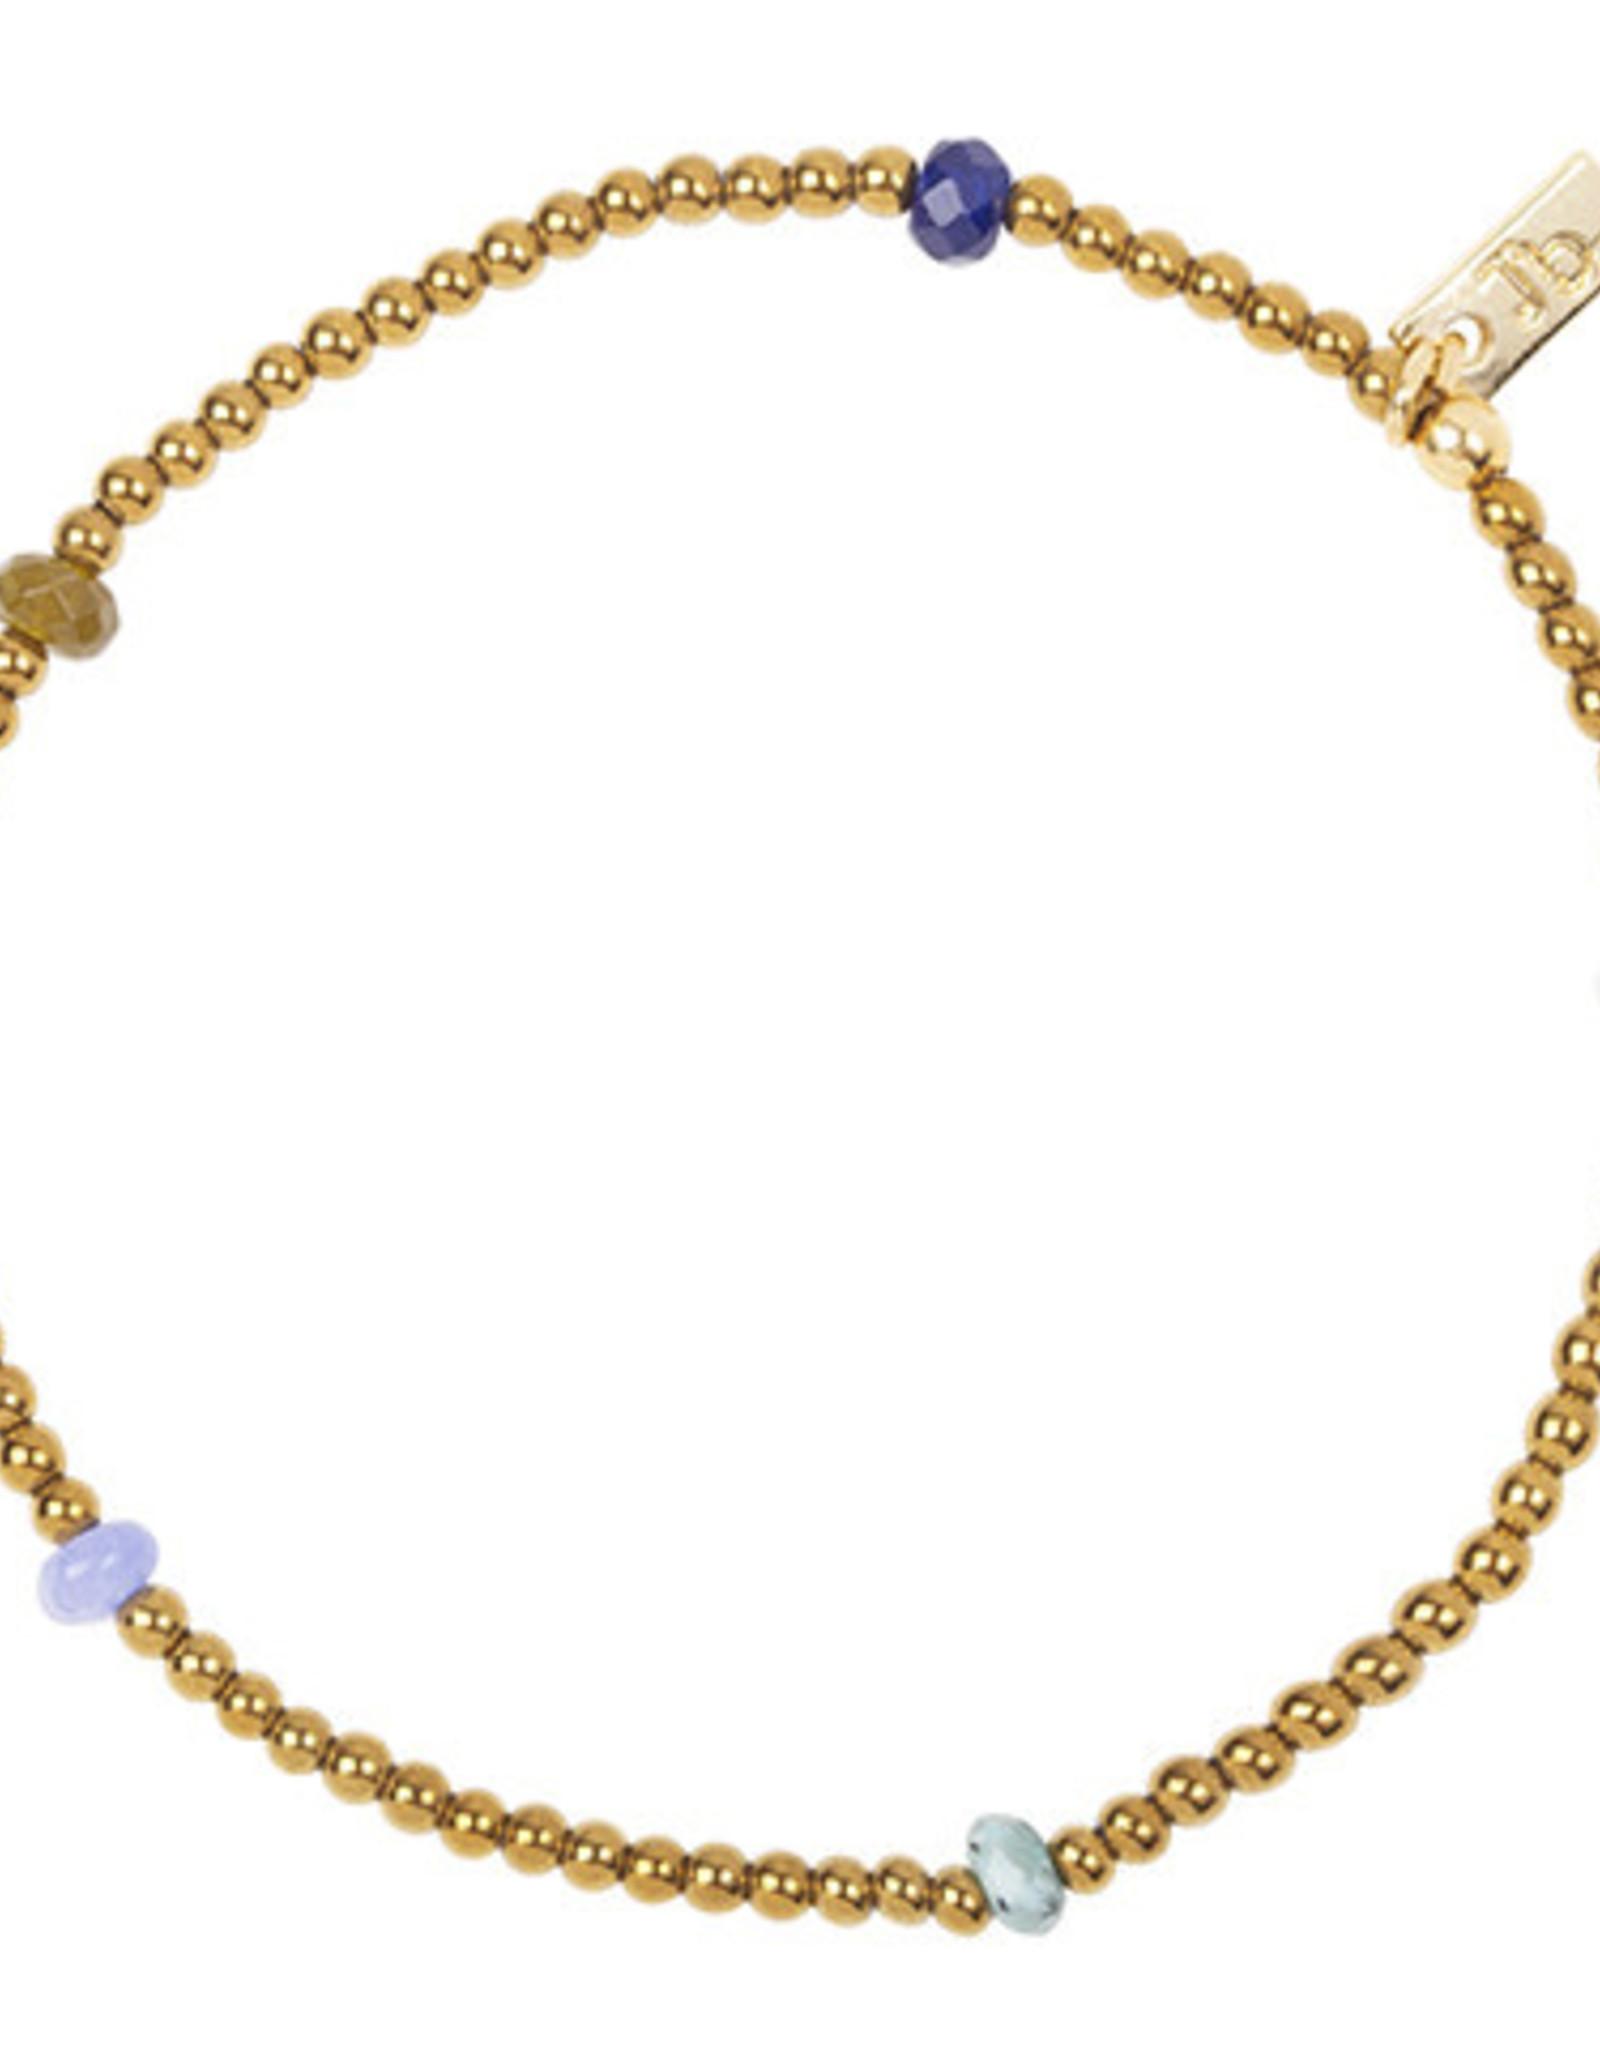 Jules Bean Armband Collectabean Madeleine-gold/rose quartz/jade mix